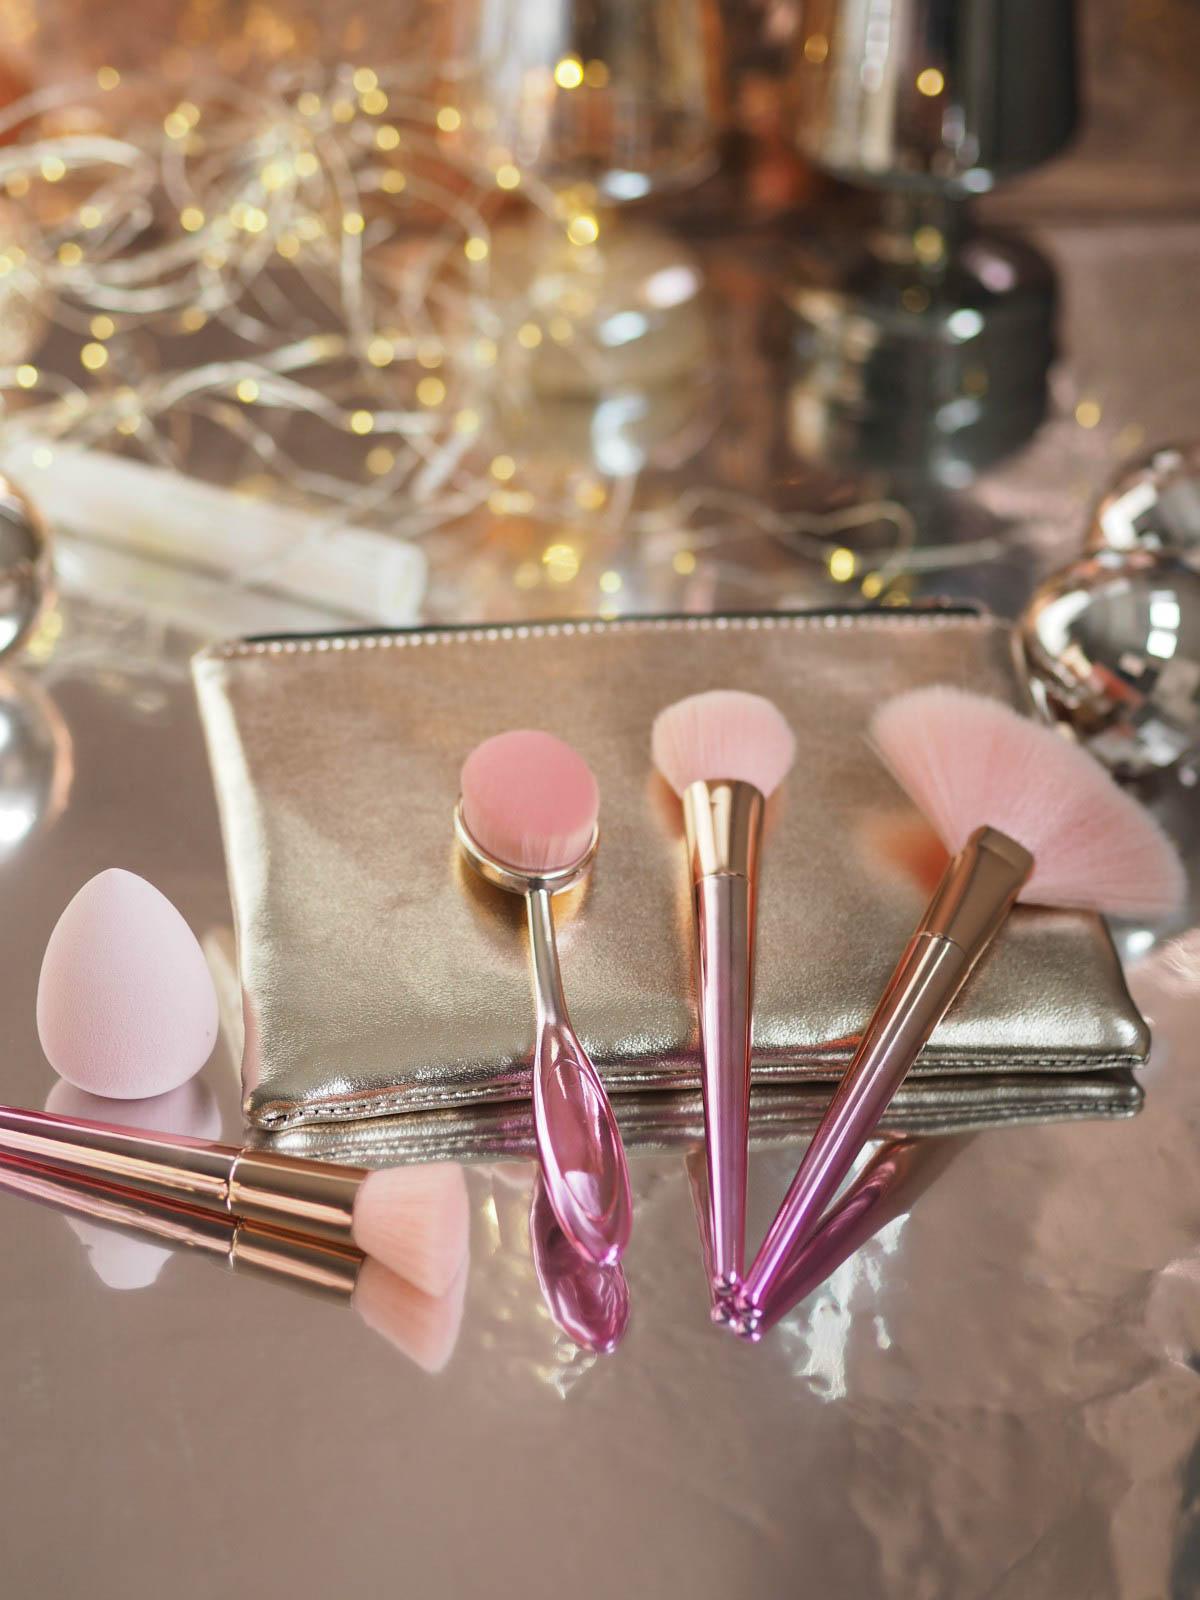 Win A Beautify Blend & Sculpt Makeup